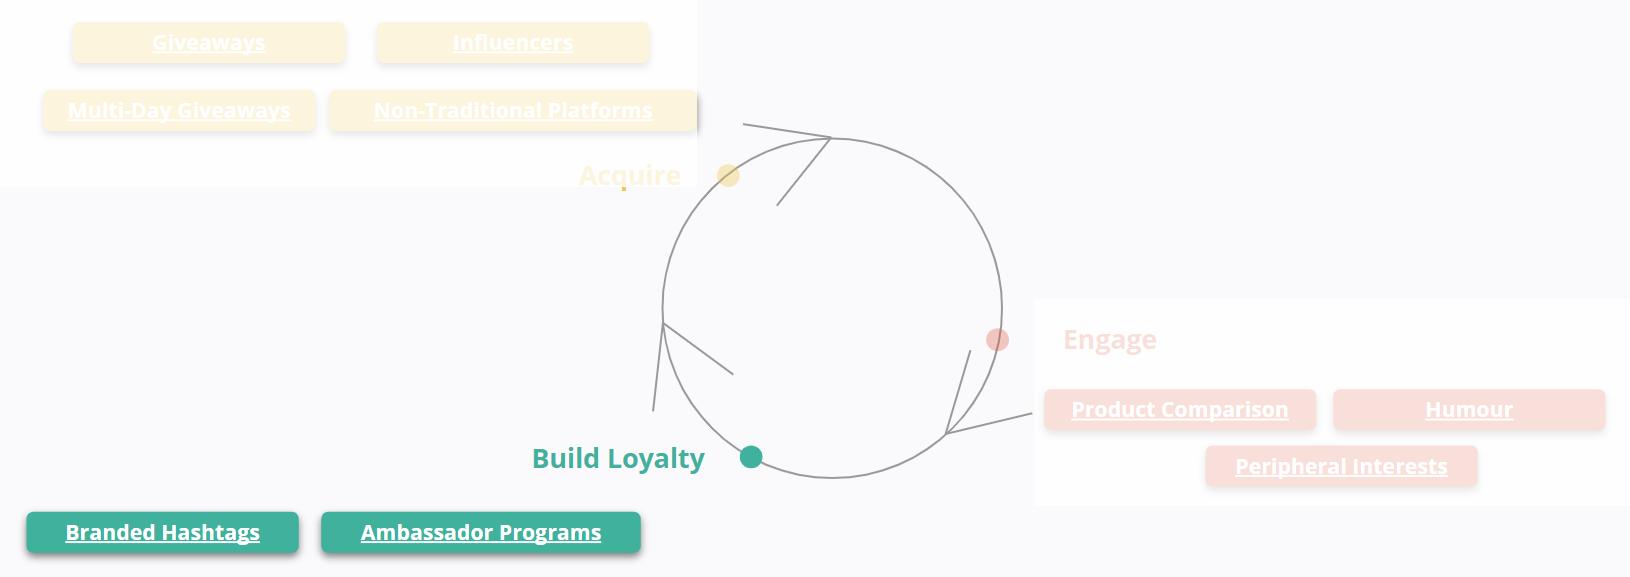 Brands - Build Loyalty